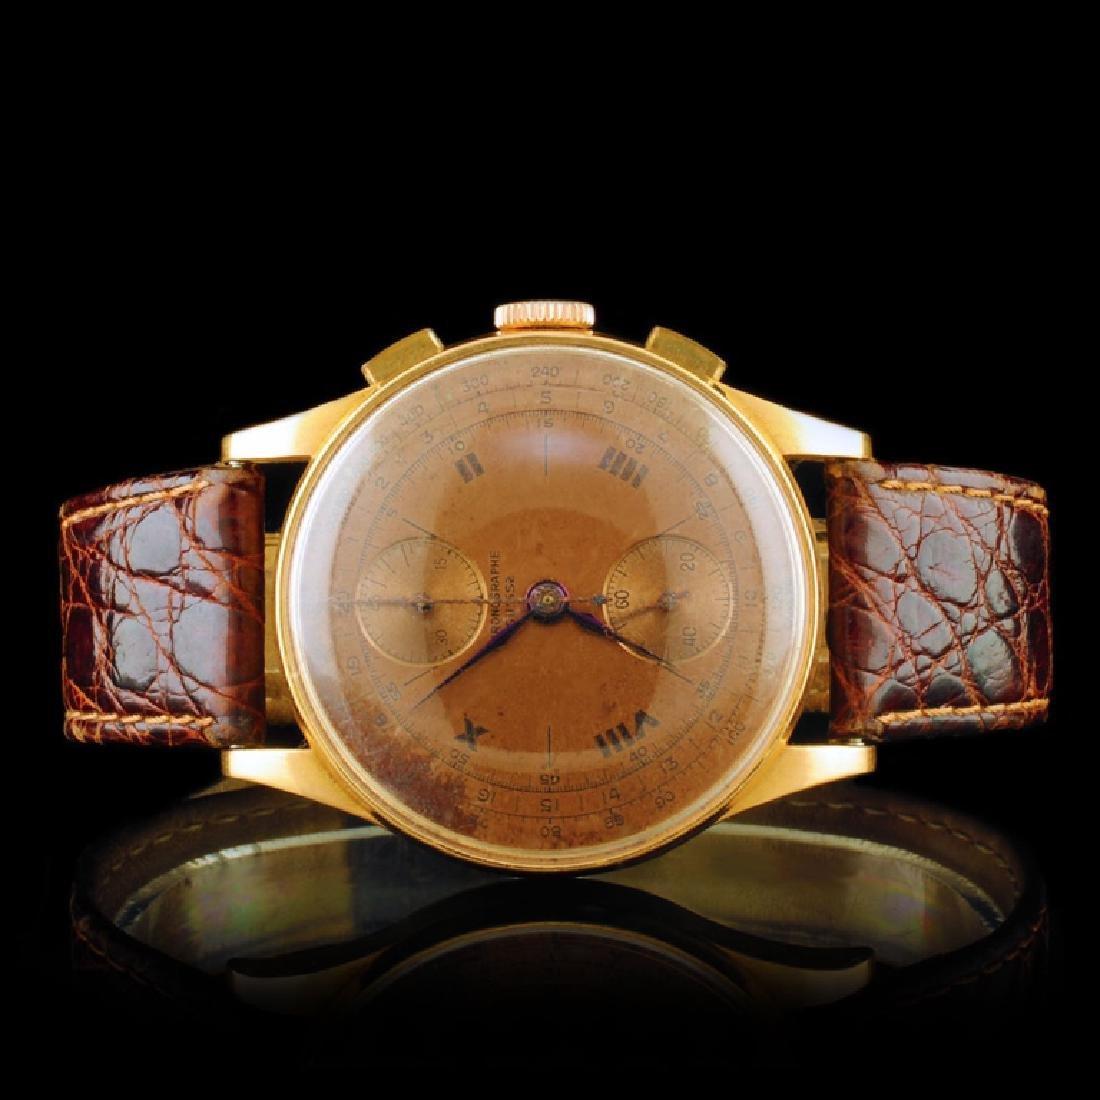 Chronographe Suisse 18K Gold 36mm 17 Jewel Watch